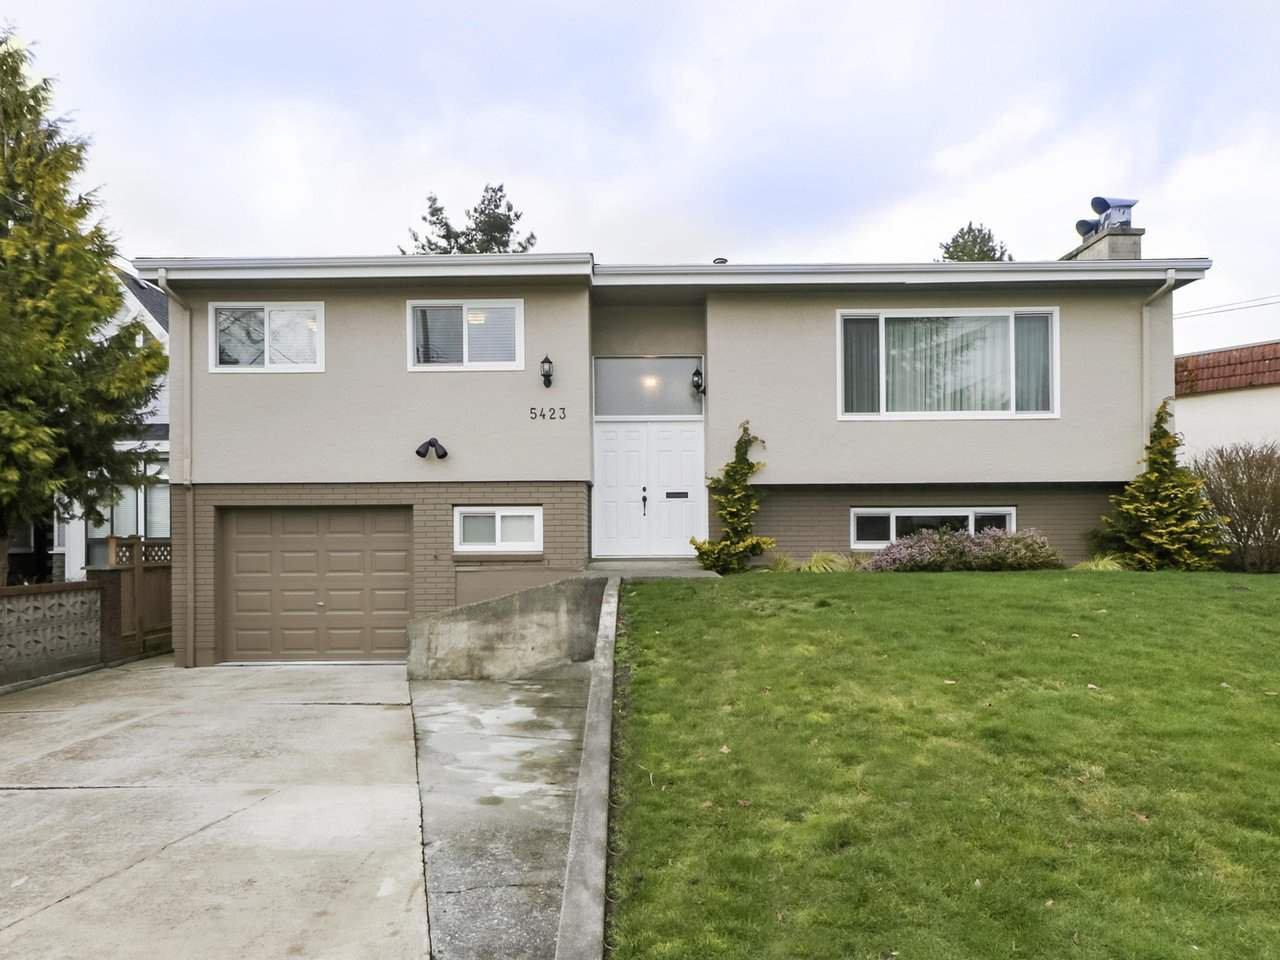 Main Photo: 5423 WESTMINSTER Avenue in Delta: Neilsen Grove House for sale (Ladner)  : MLS®# R2431608